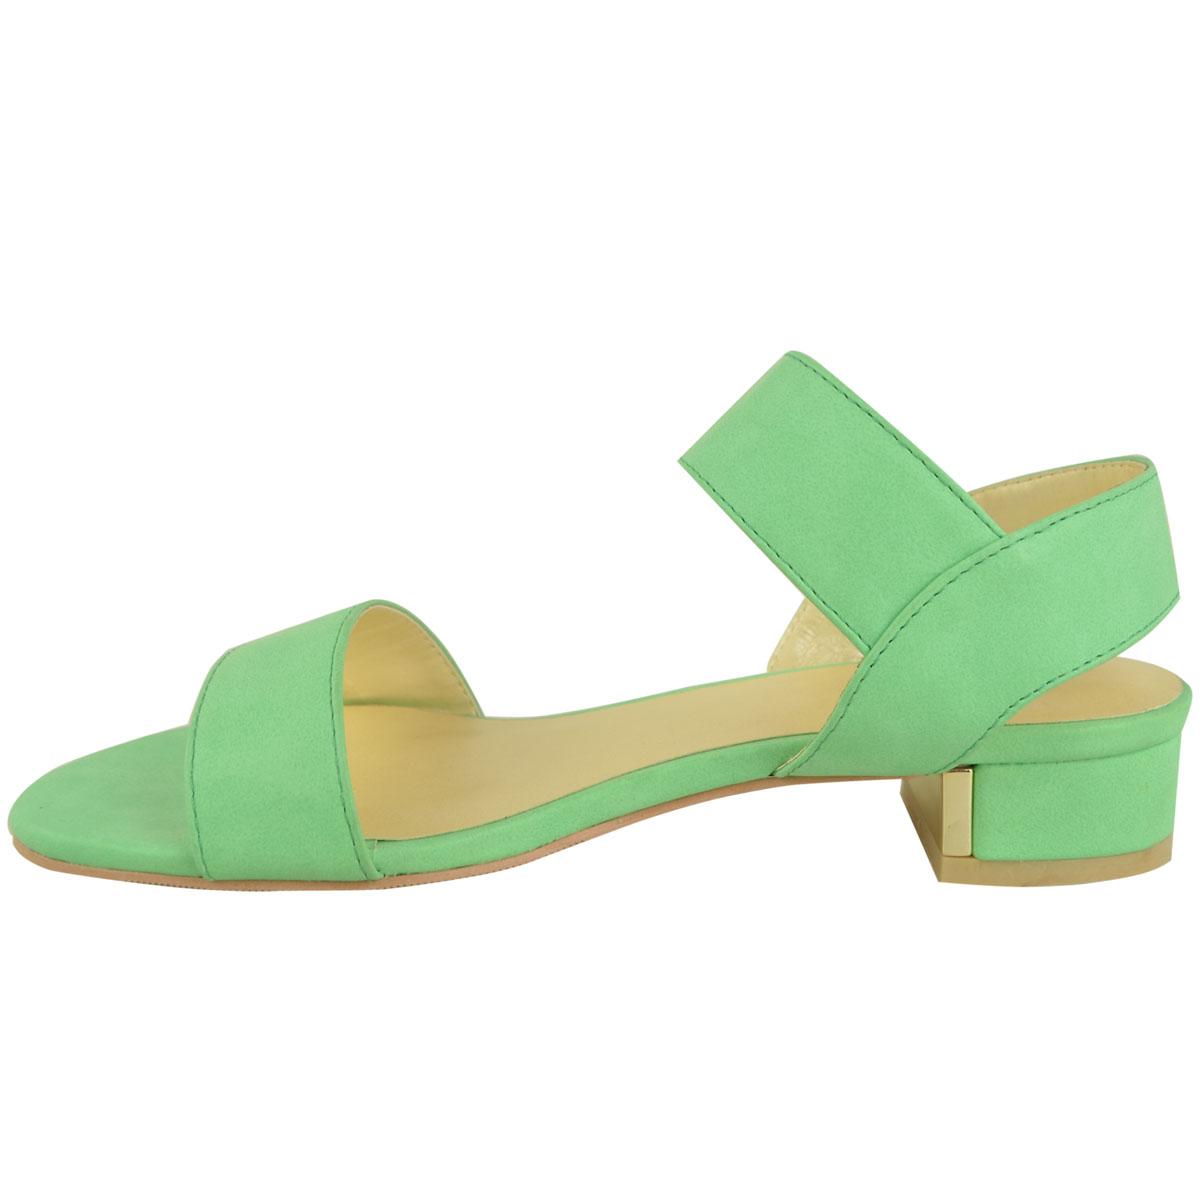 Womens sandals ebay - Womens Low Heel Sandals